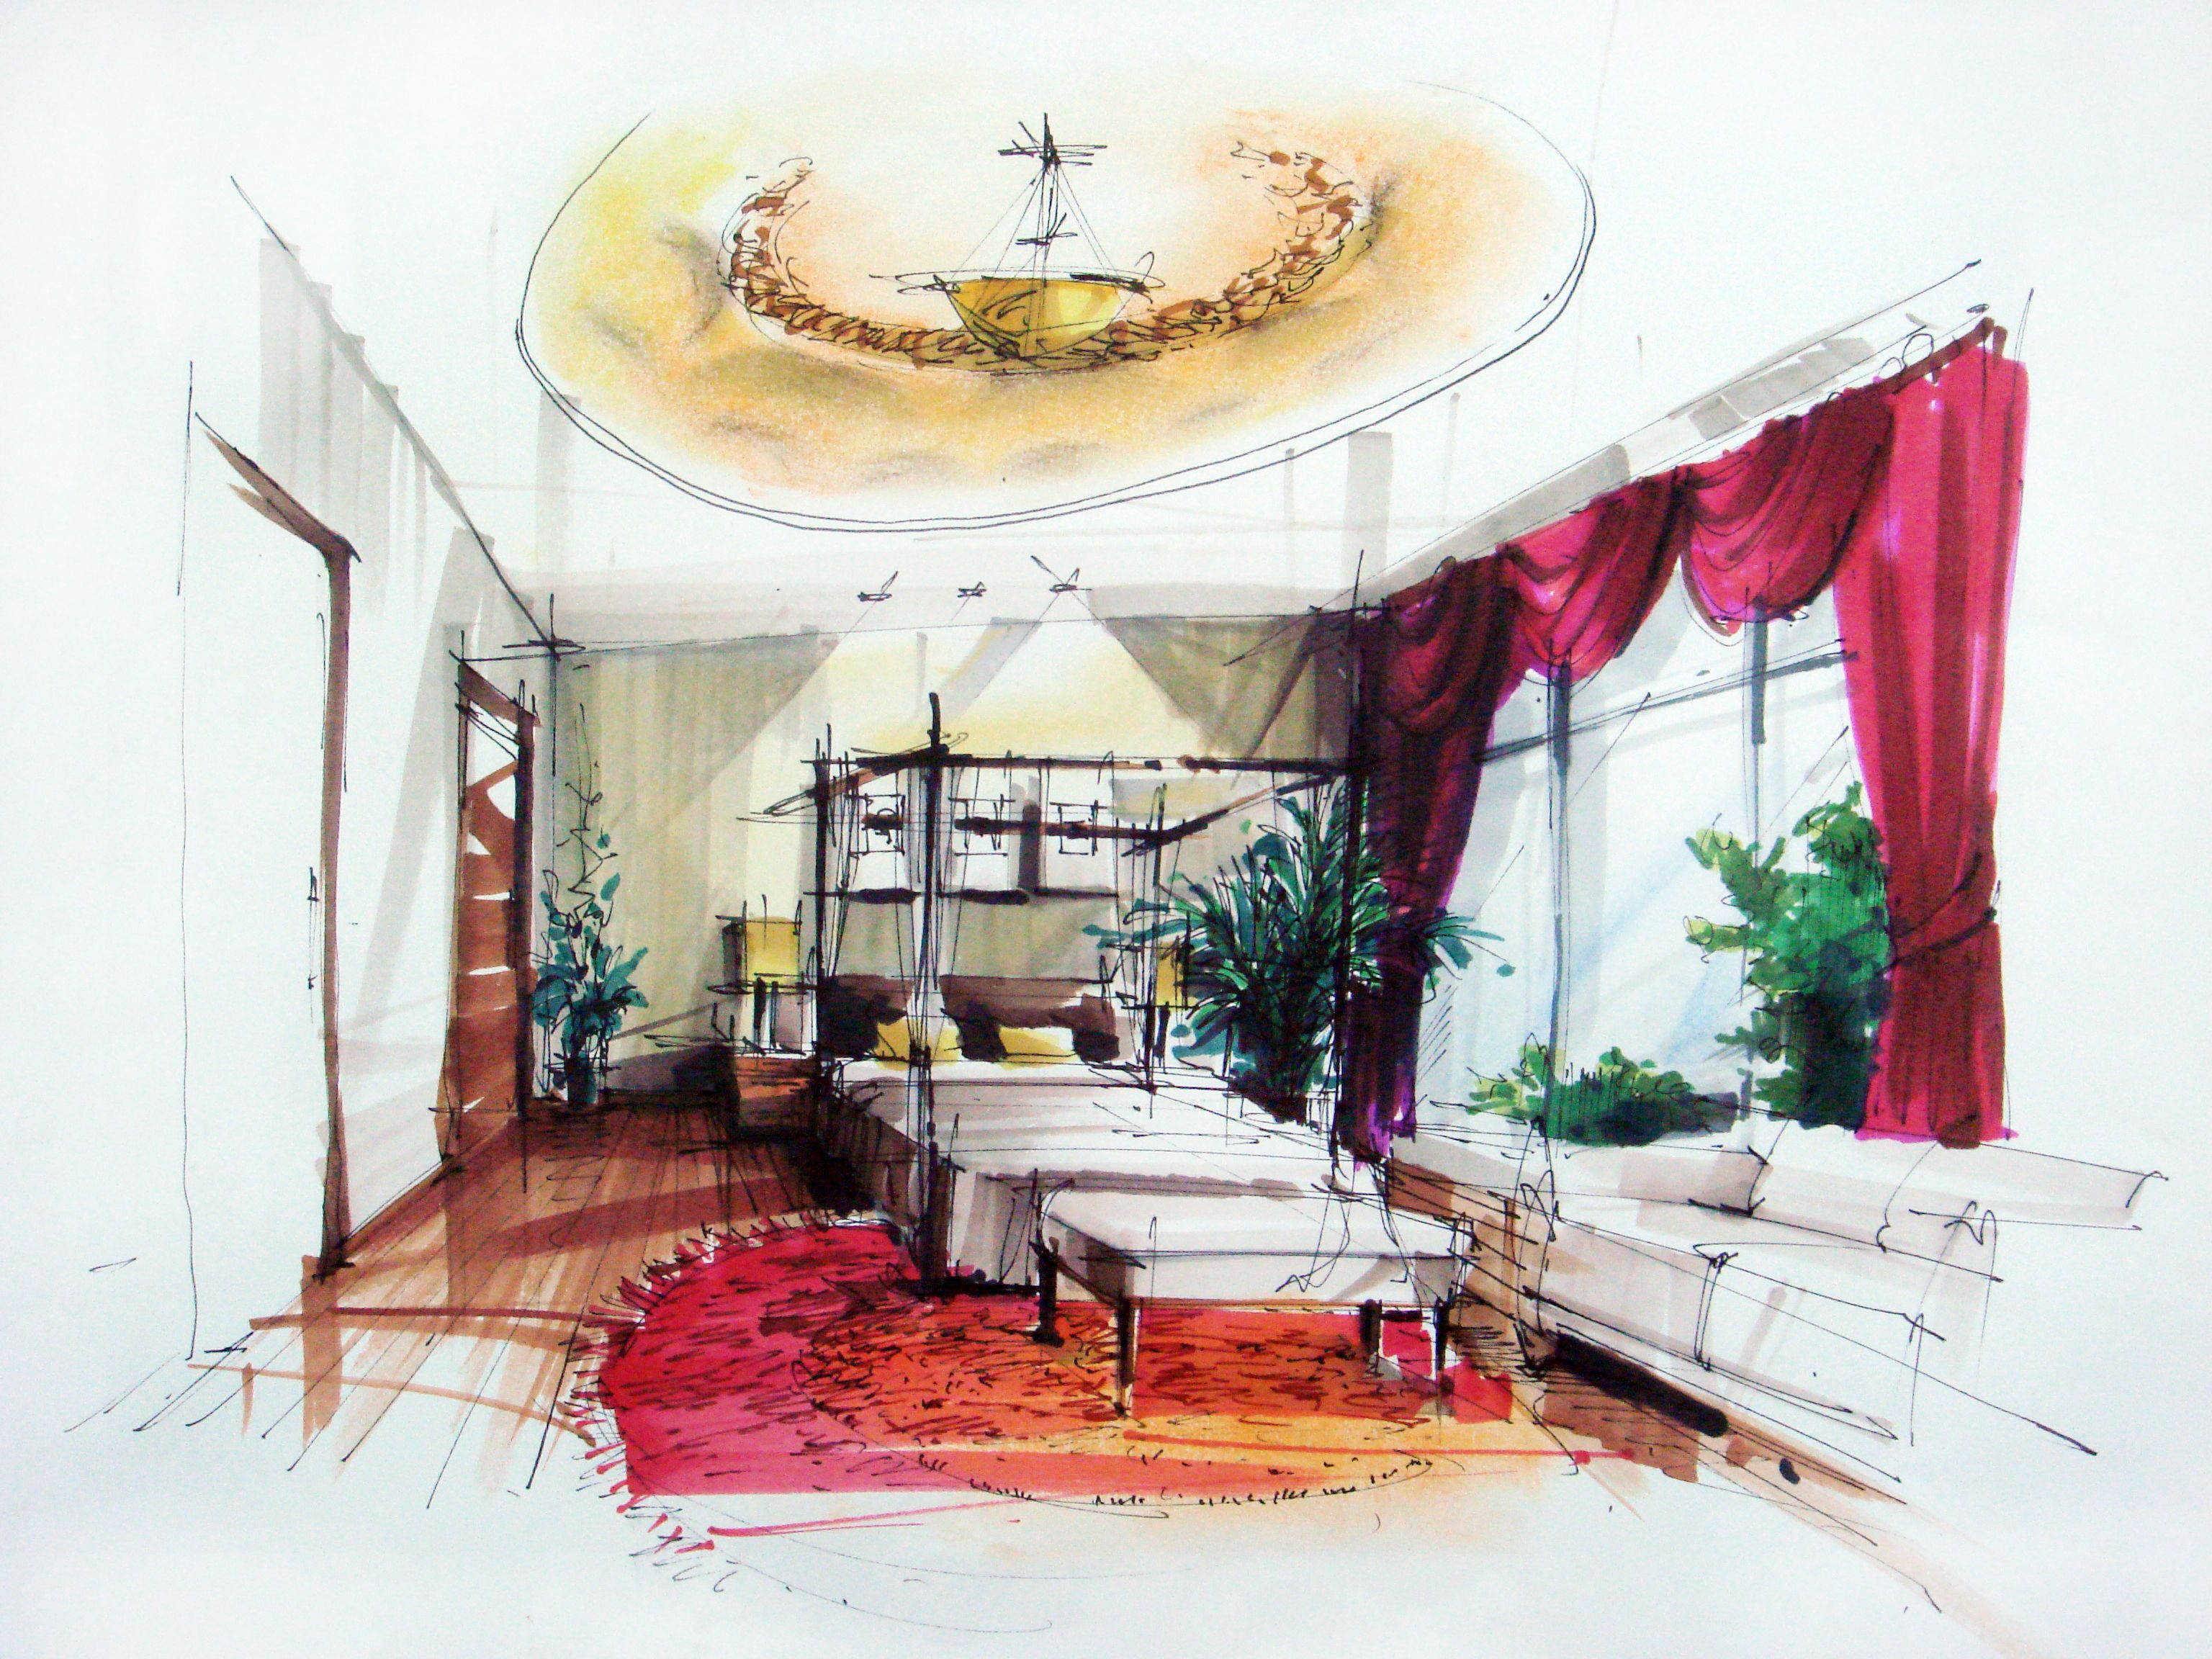 Merveilleux Interior Design Drawings   Google Search